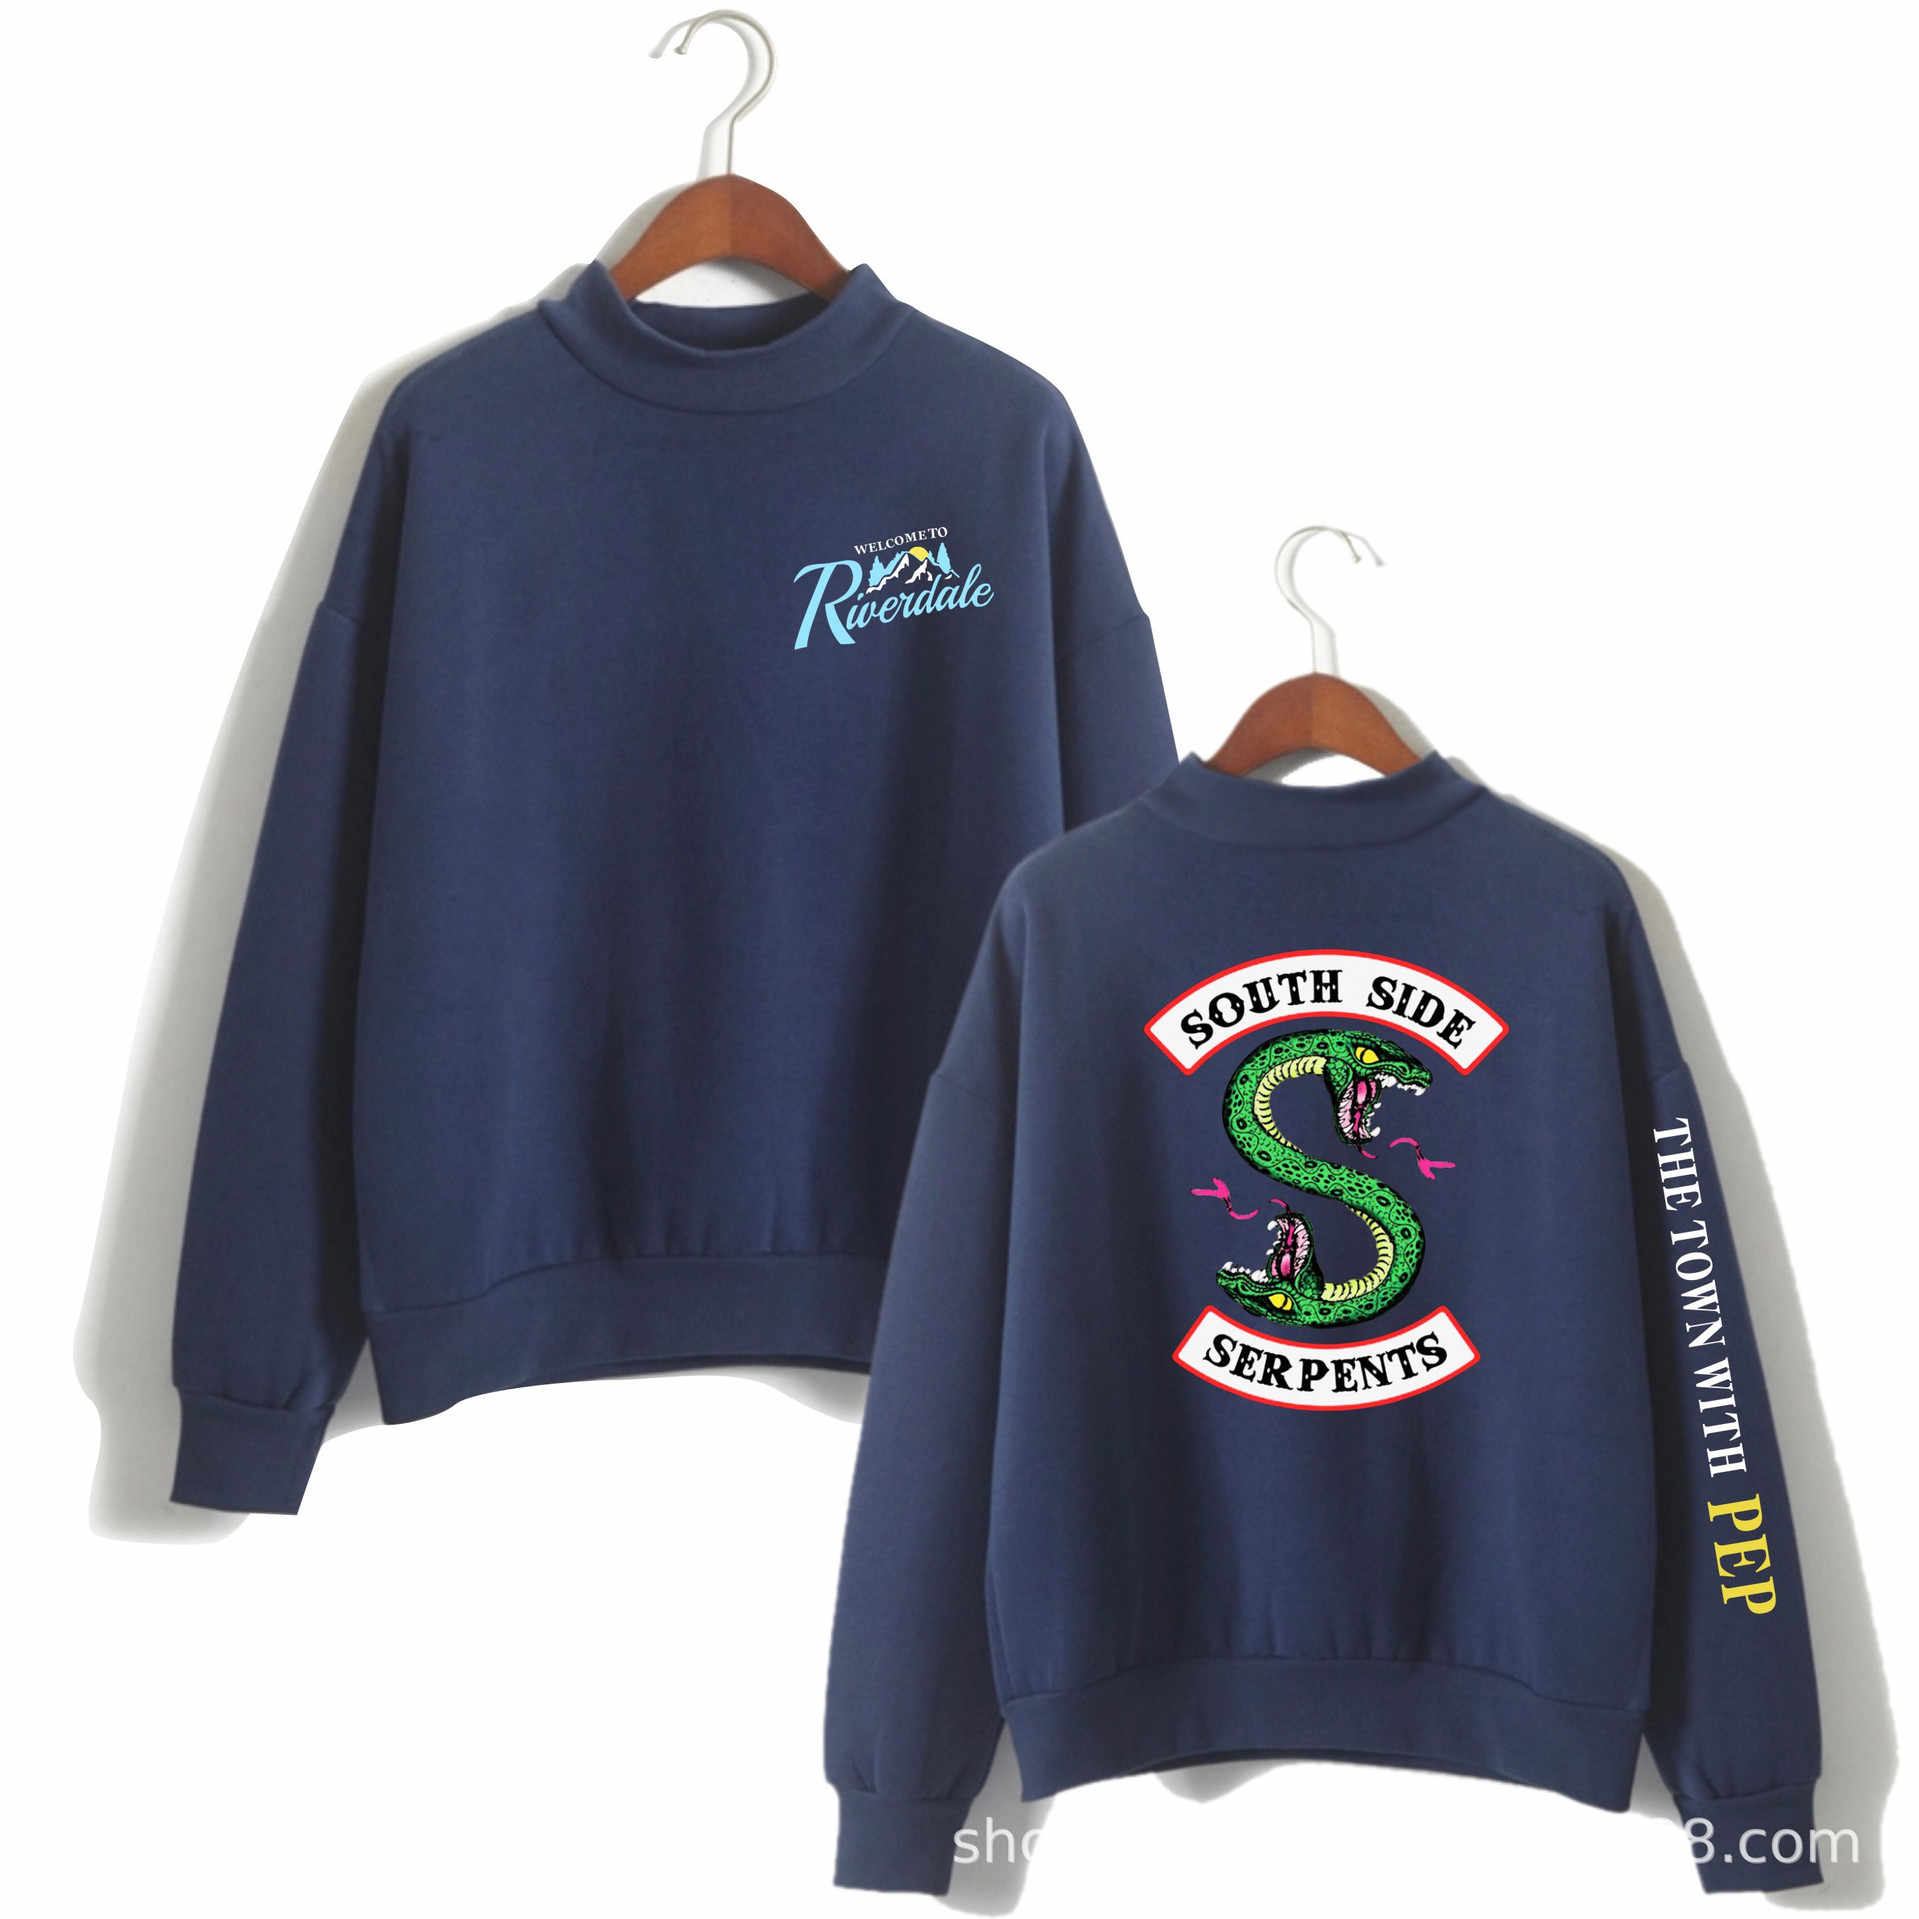 New Fashion Riverdale Sweatshirt Pullovers Tops Women Hip Hop Streetwear Female Kpop Fans Oversized Clothes South Side Hoodies